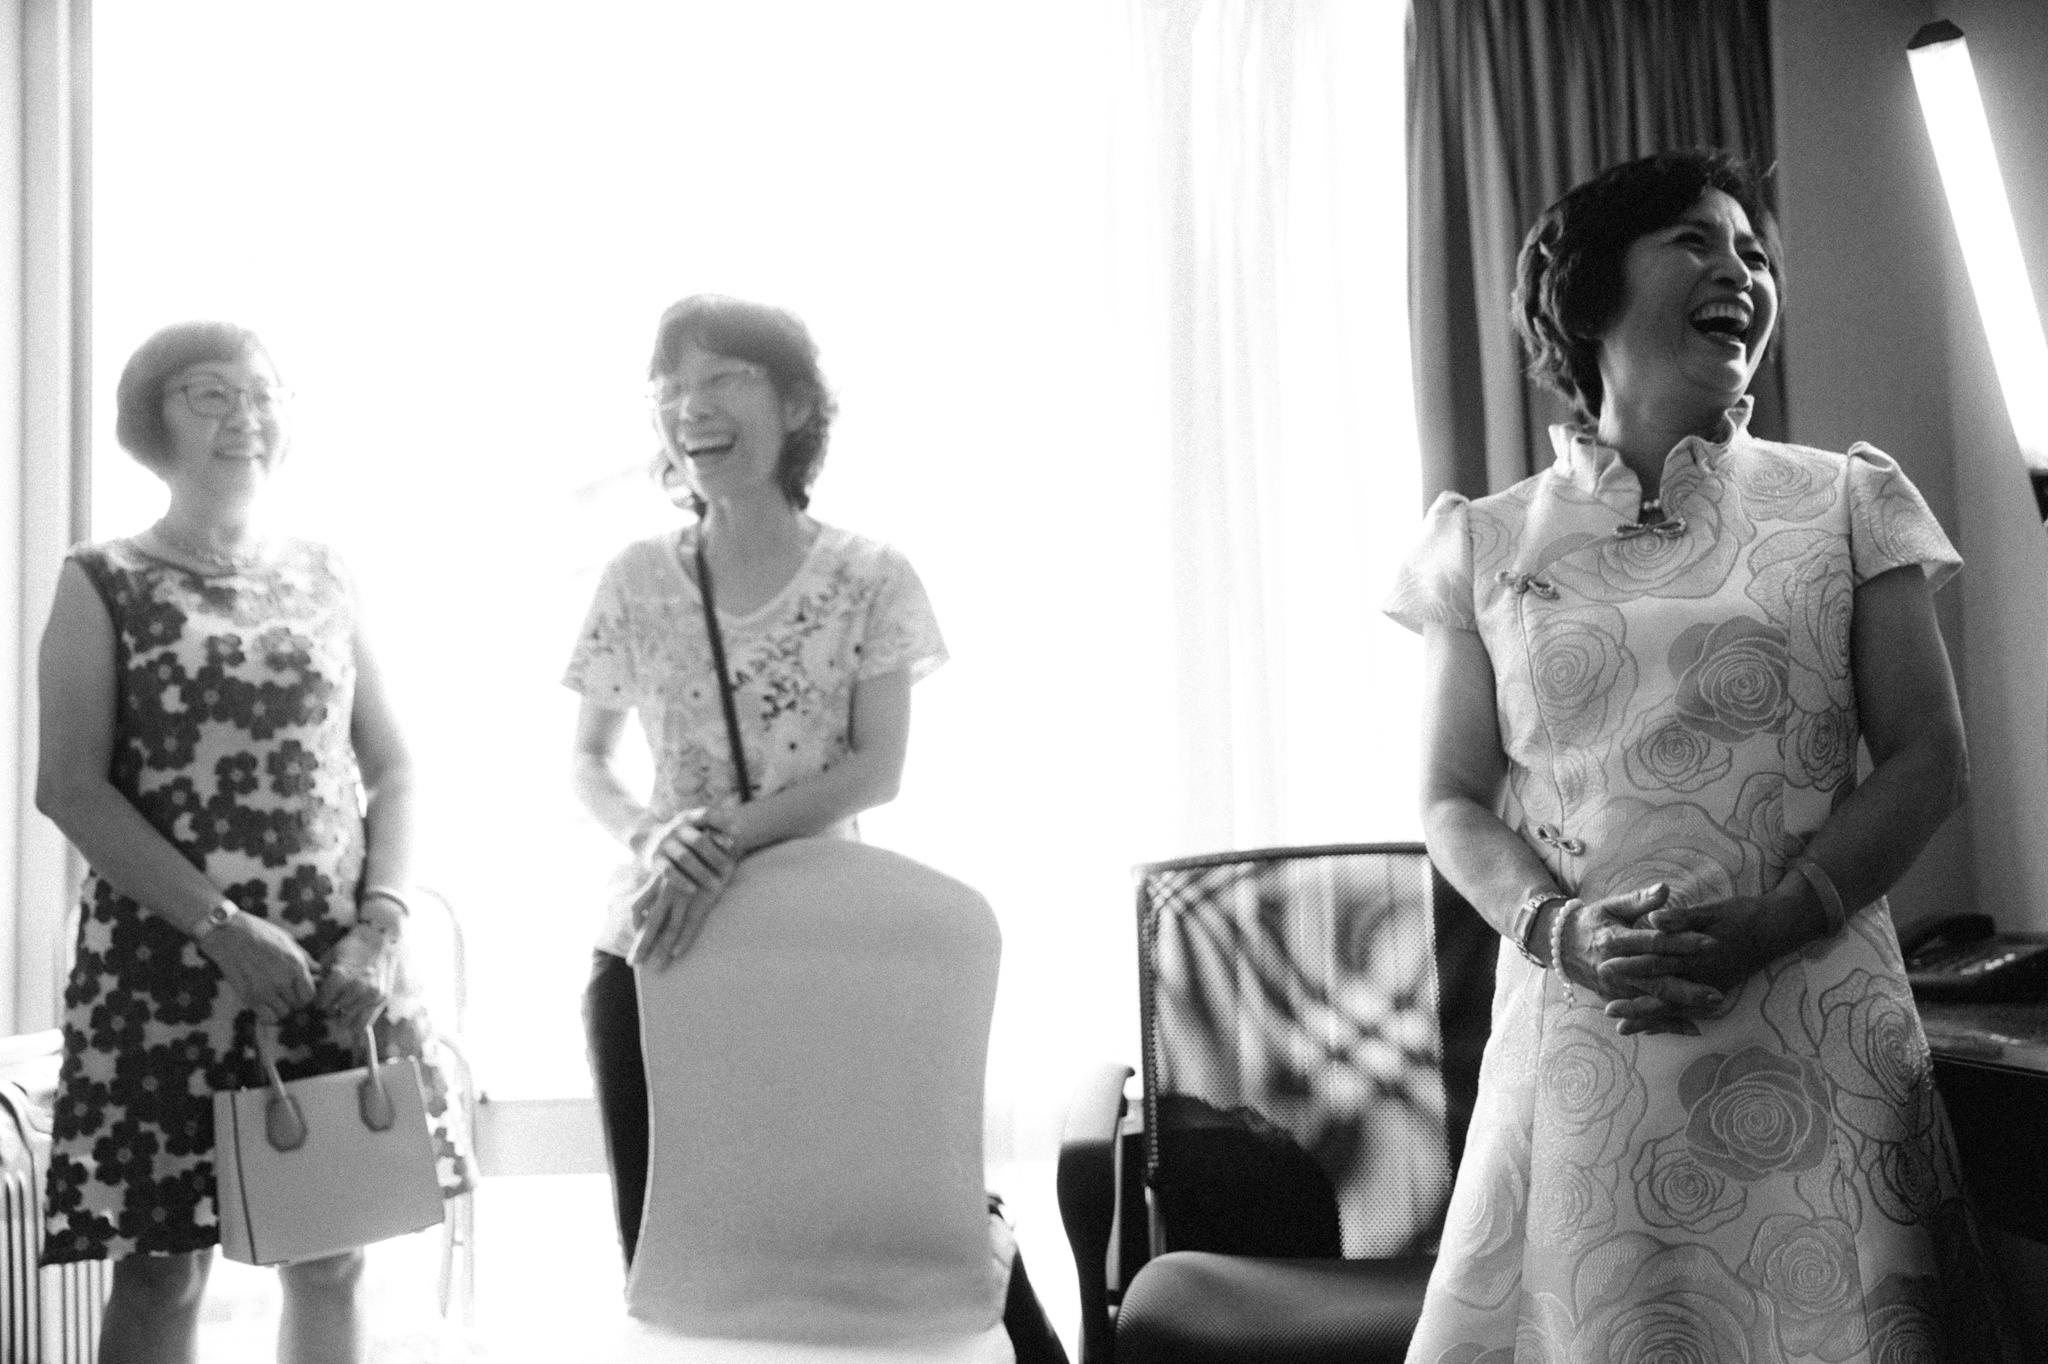 Tina+Nash-wedding-台北婚禮迎娶晚宴-新莊終身大事-052.jpg